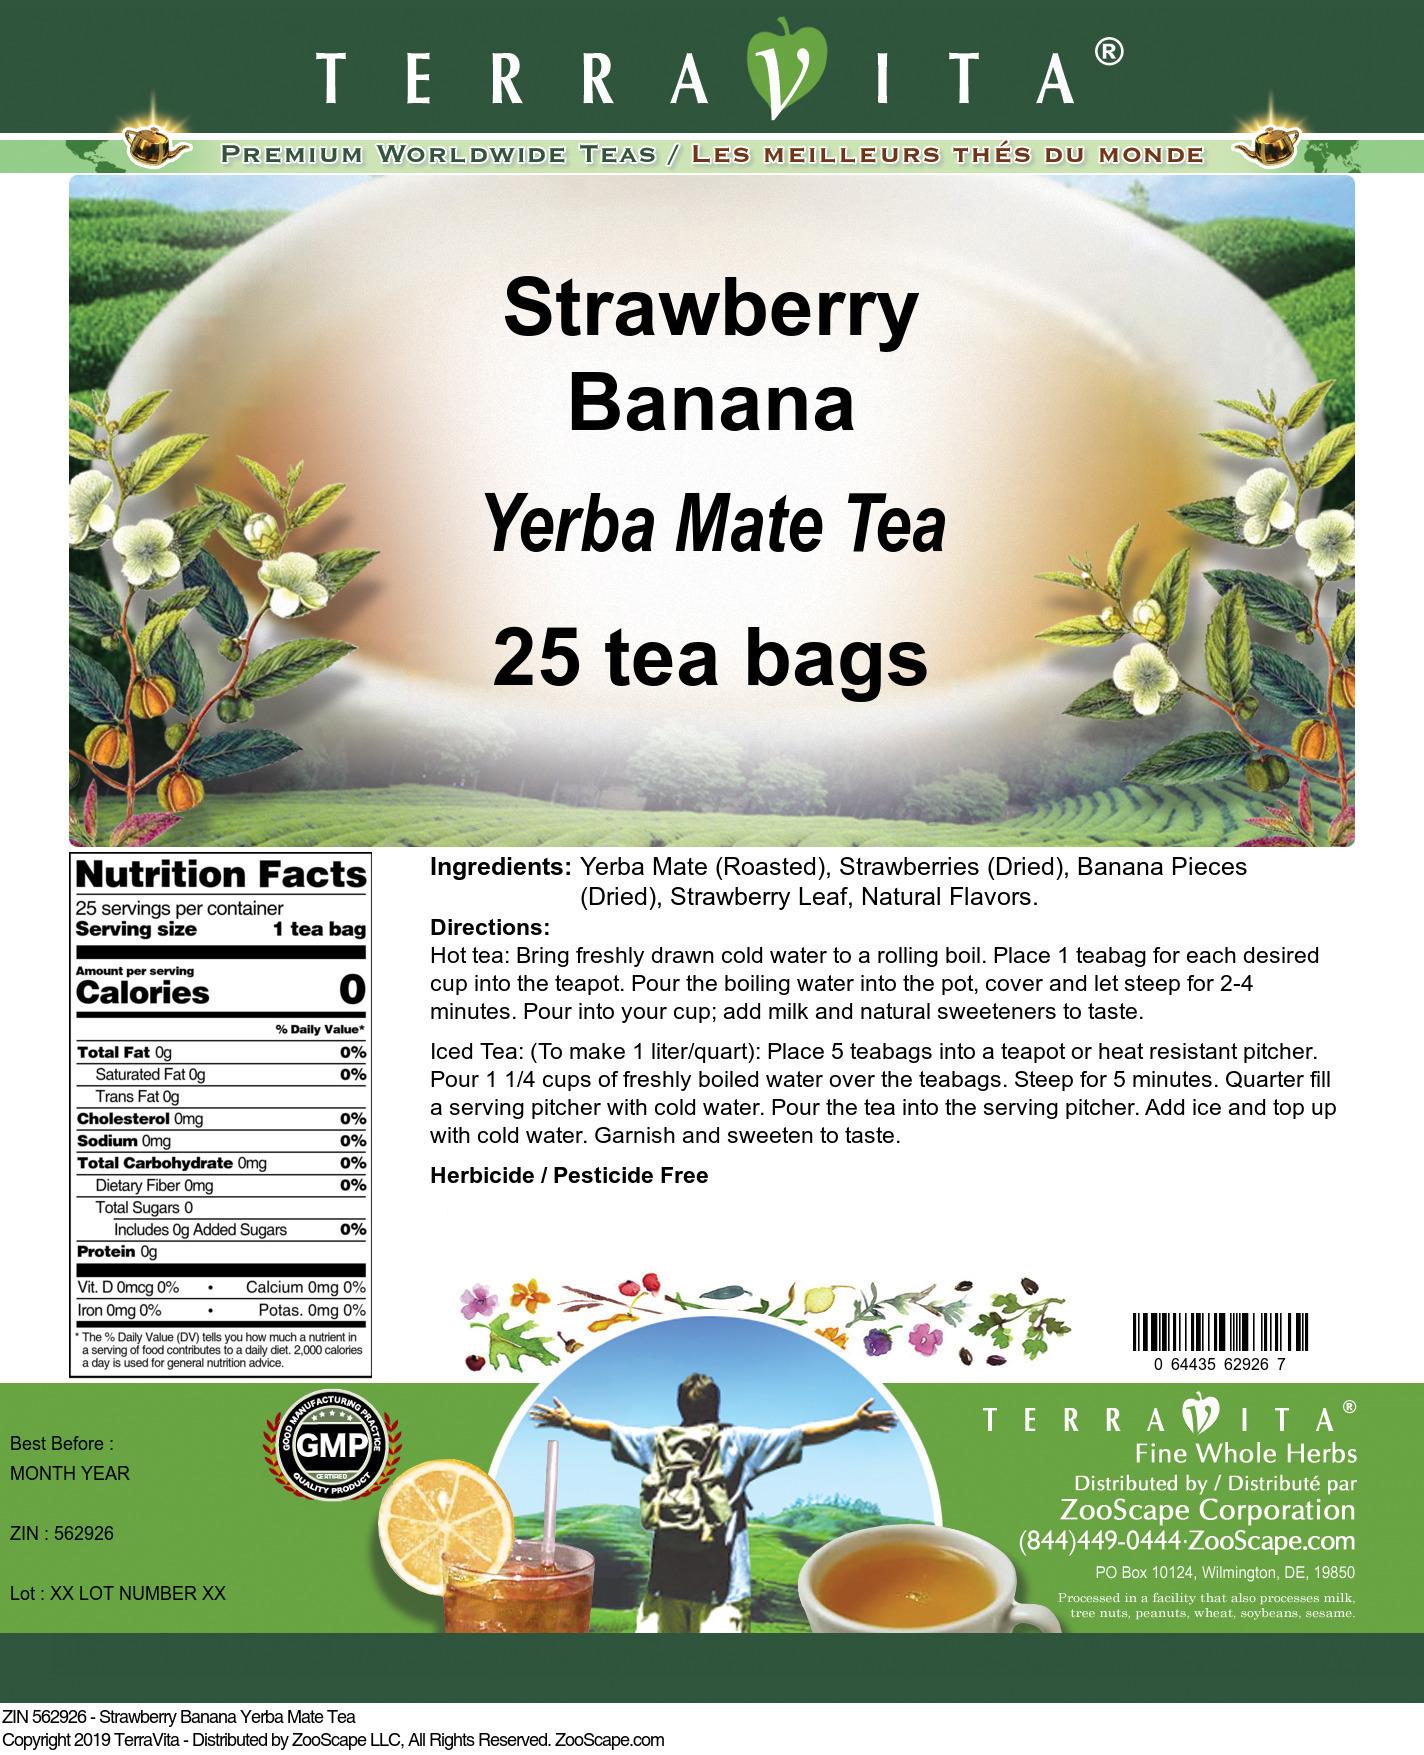 Strawberry Banana Yerba Mate Tea